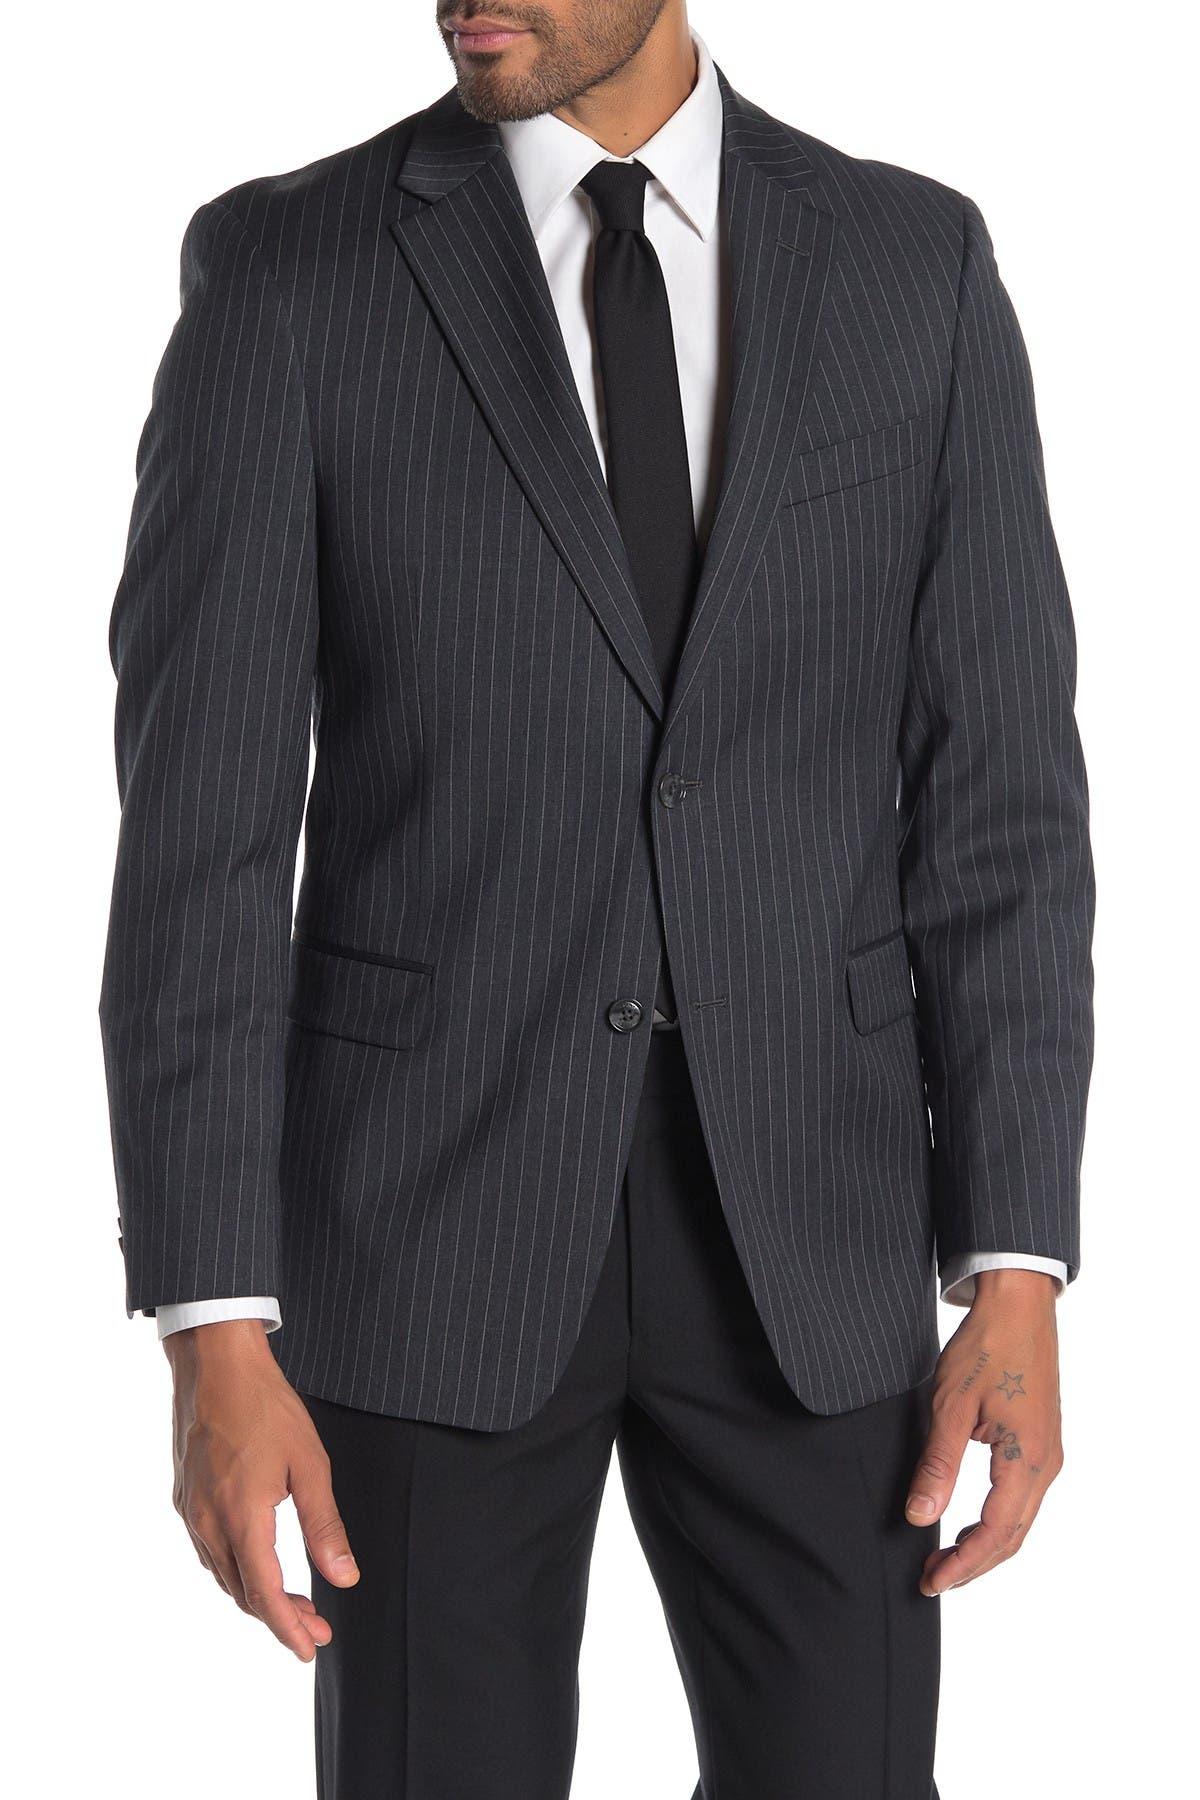 Image of Tommy Hilfiger Slim Fit Wool Blend Pinstripe Suit Separate Jacket